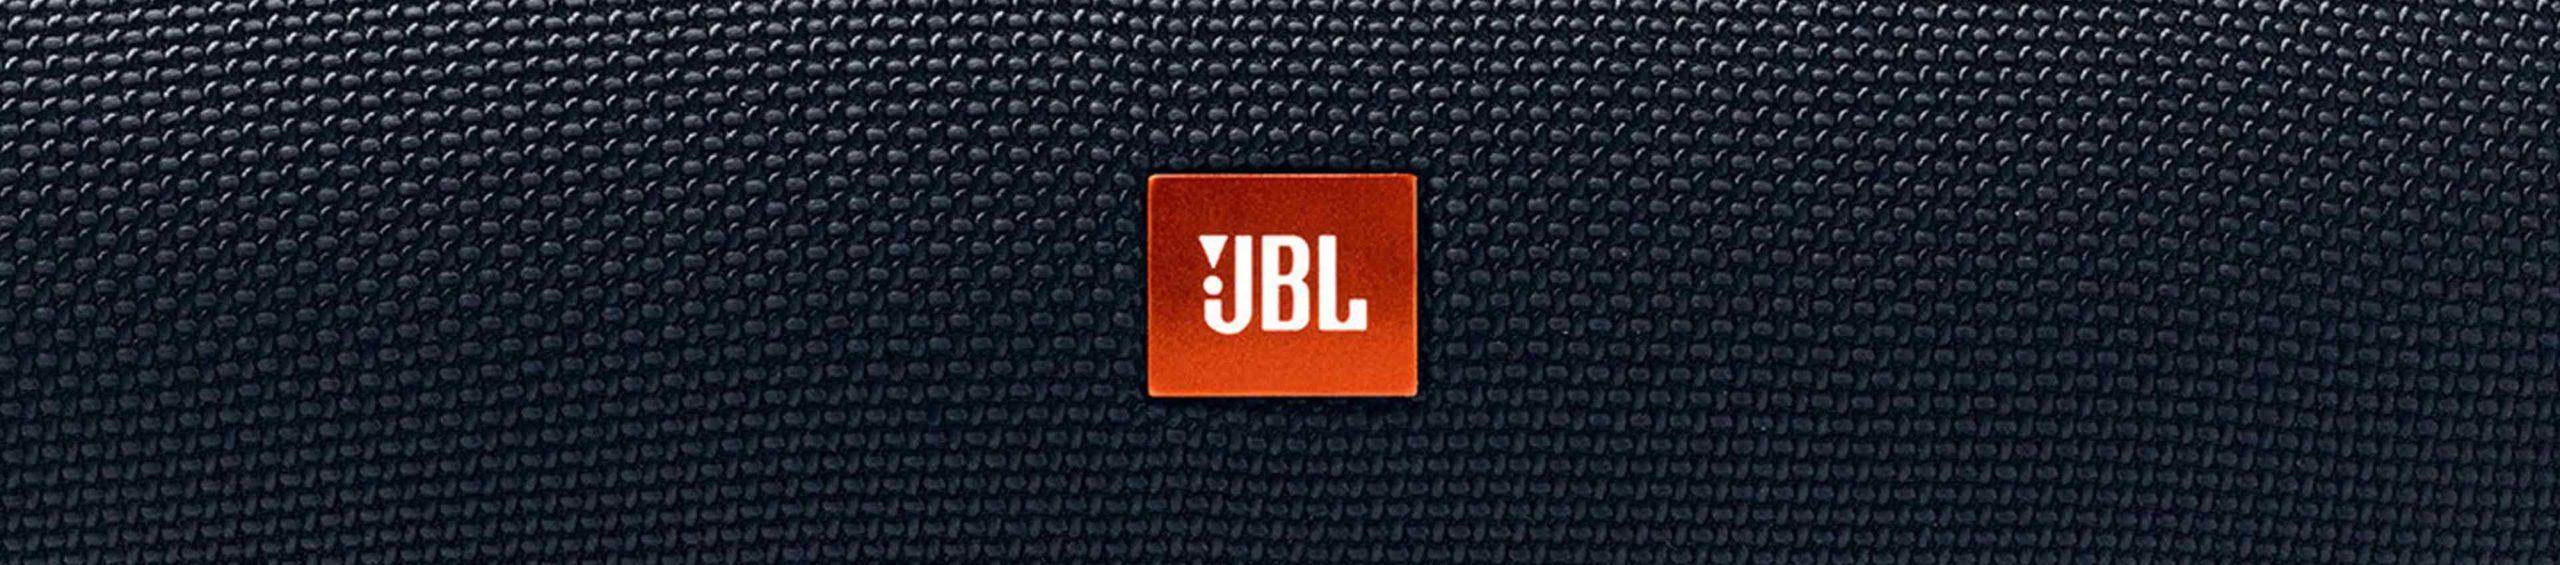 JBL Charge 4 Black Friday